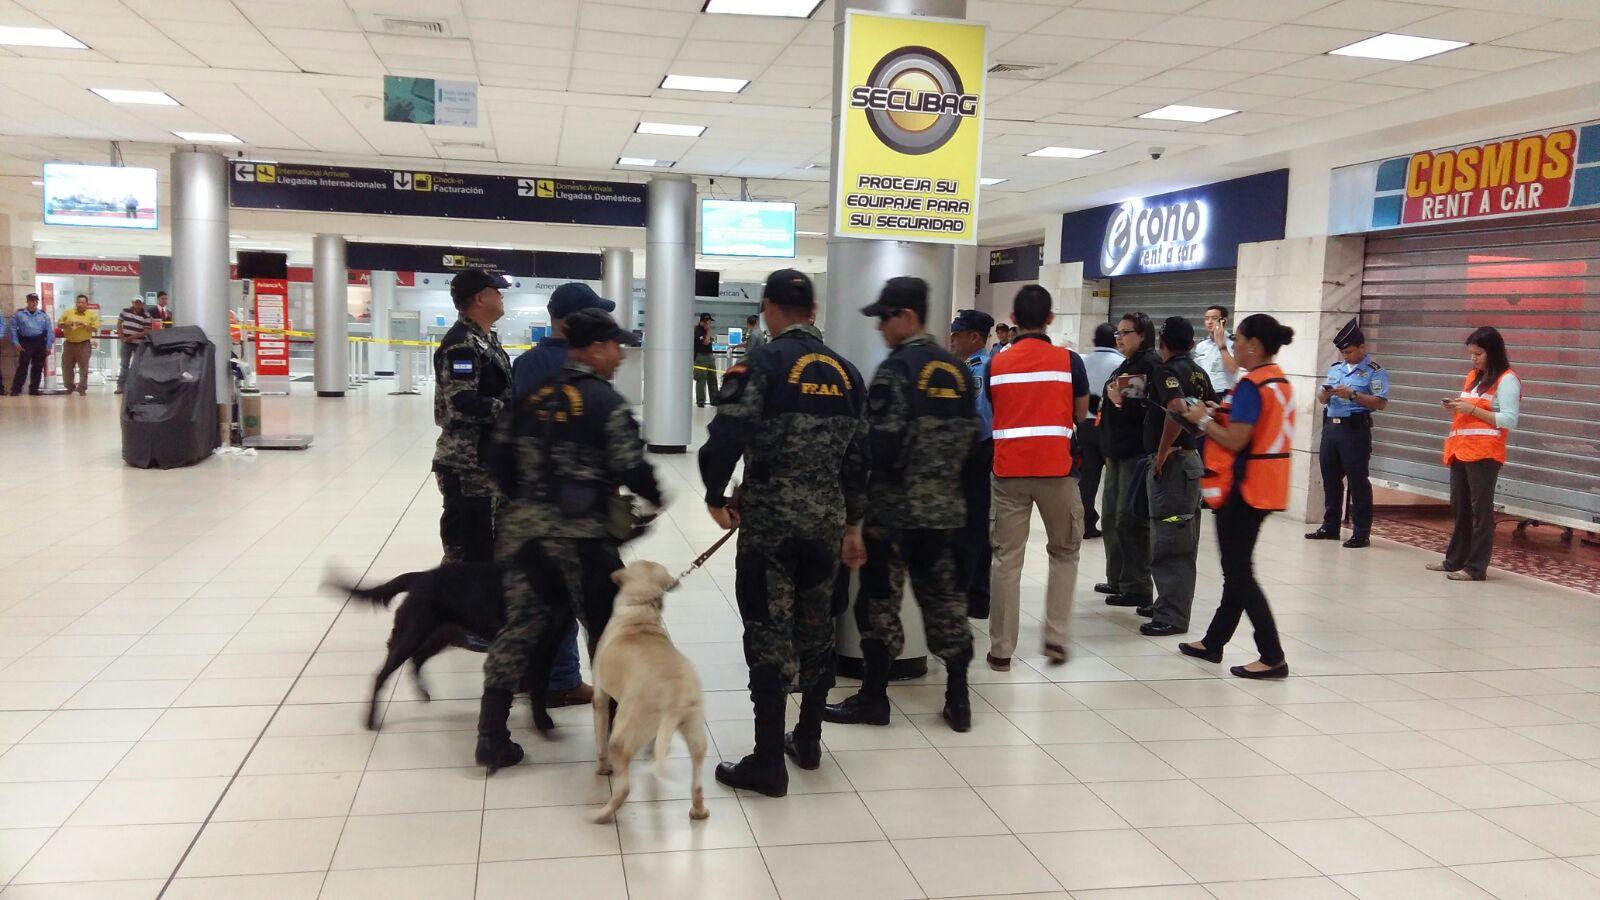 Falsa alarma de bomba puso de correr a viajeros en Toncontín